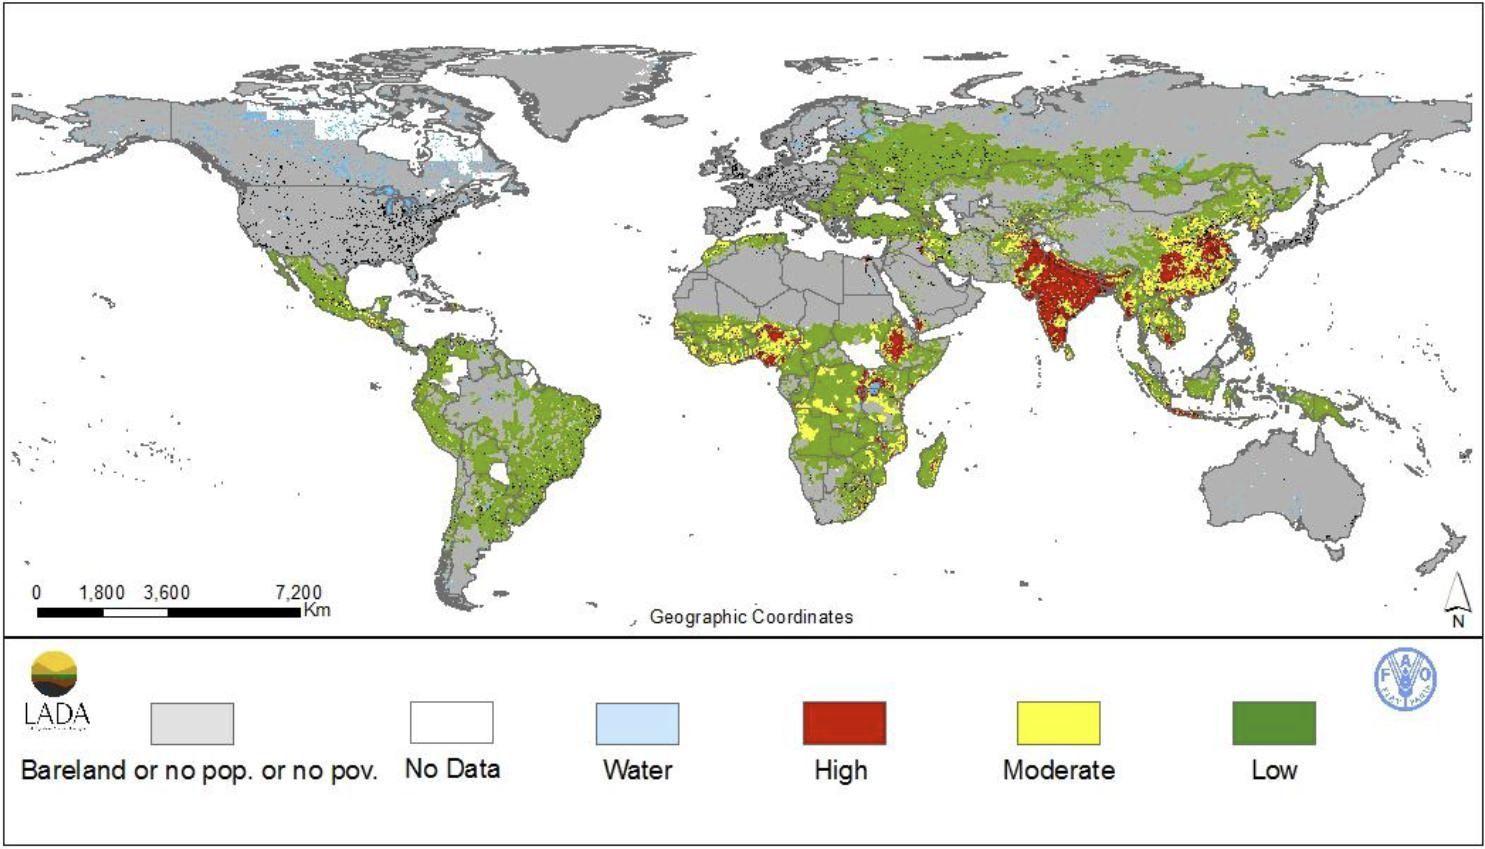 Agriculture World Map.Land Degradation Impact Index By Nachtergaele Et Al Map